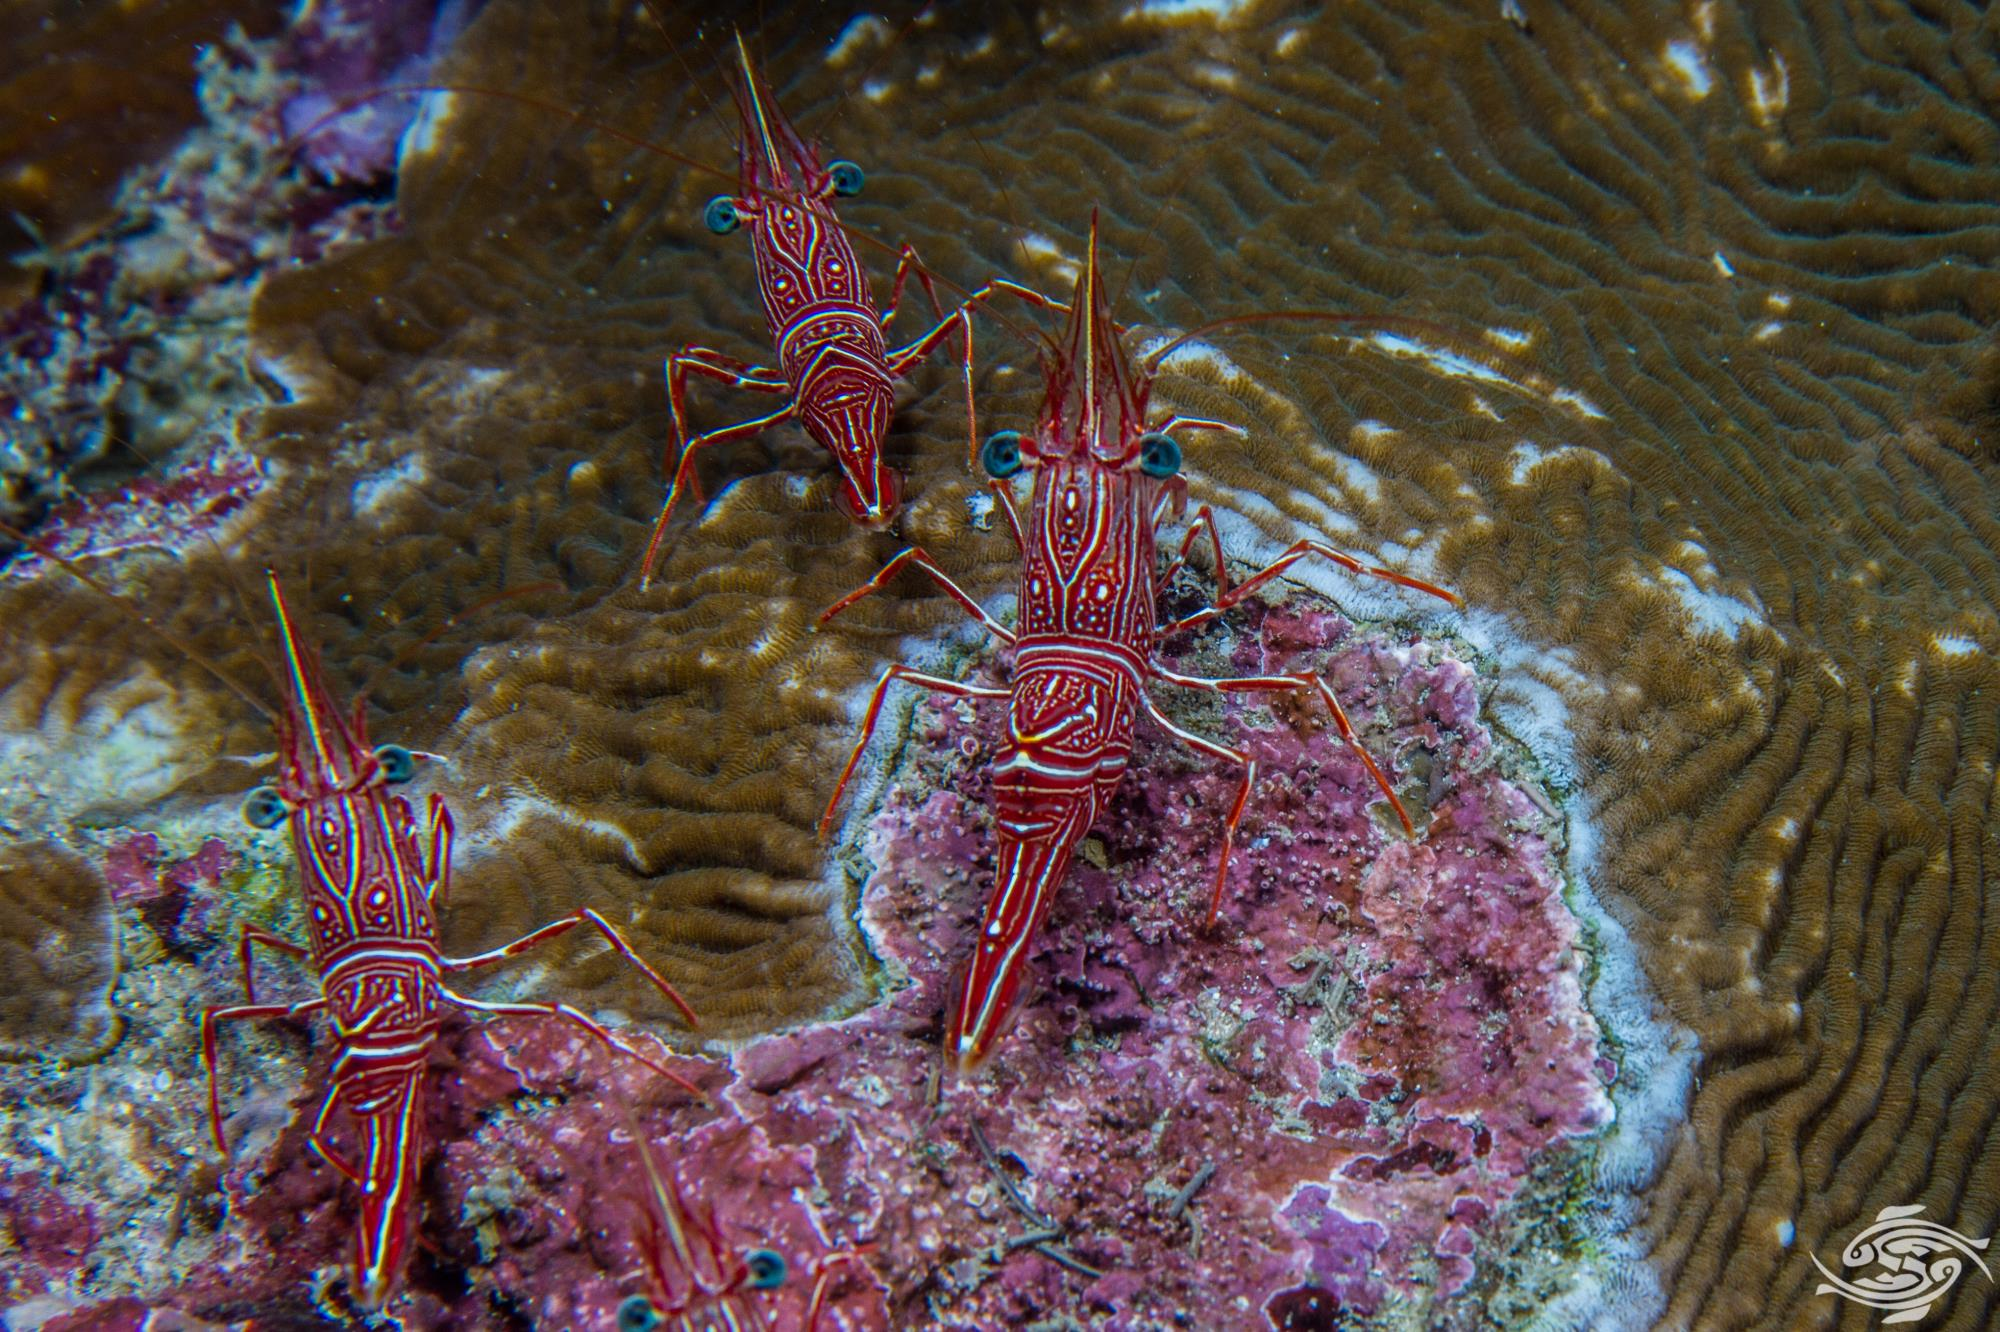 Durban Dancing Shrimp (Rhynchocinetes durbanensis)